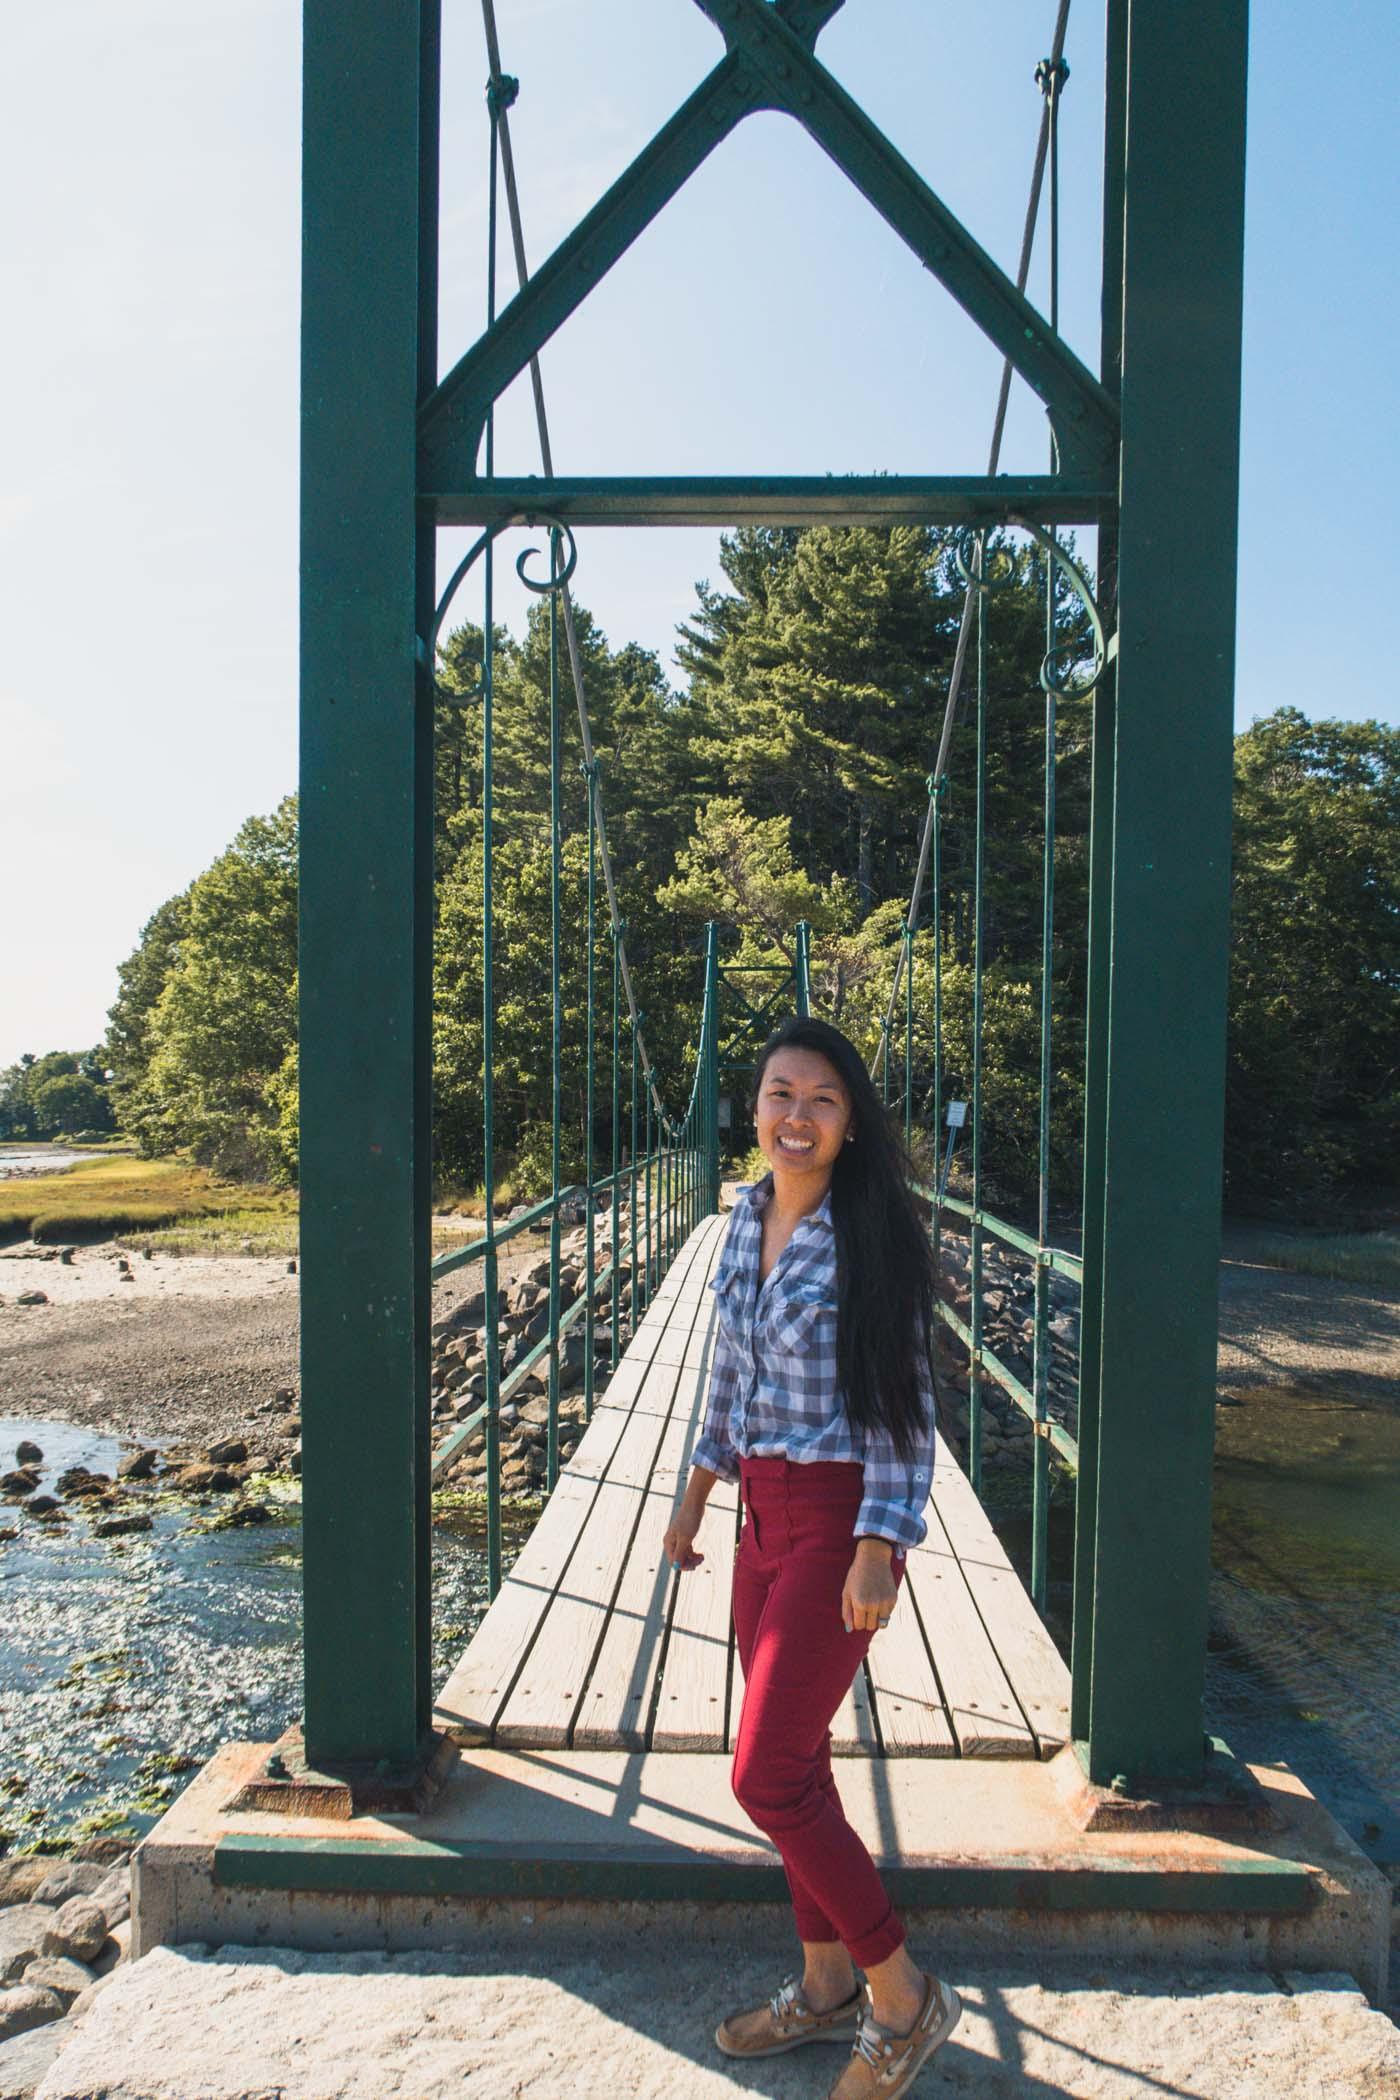 Walking the Wiggly Bridge in York, Maine / Simply Lovebirds